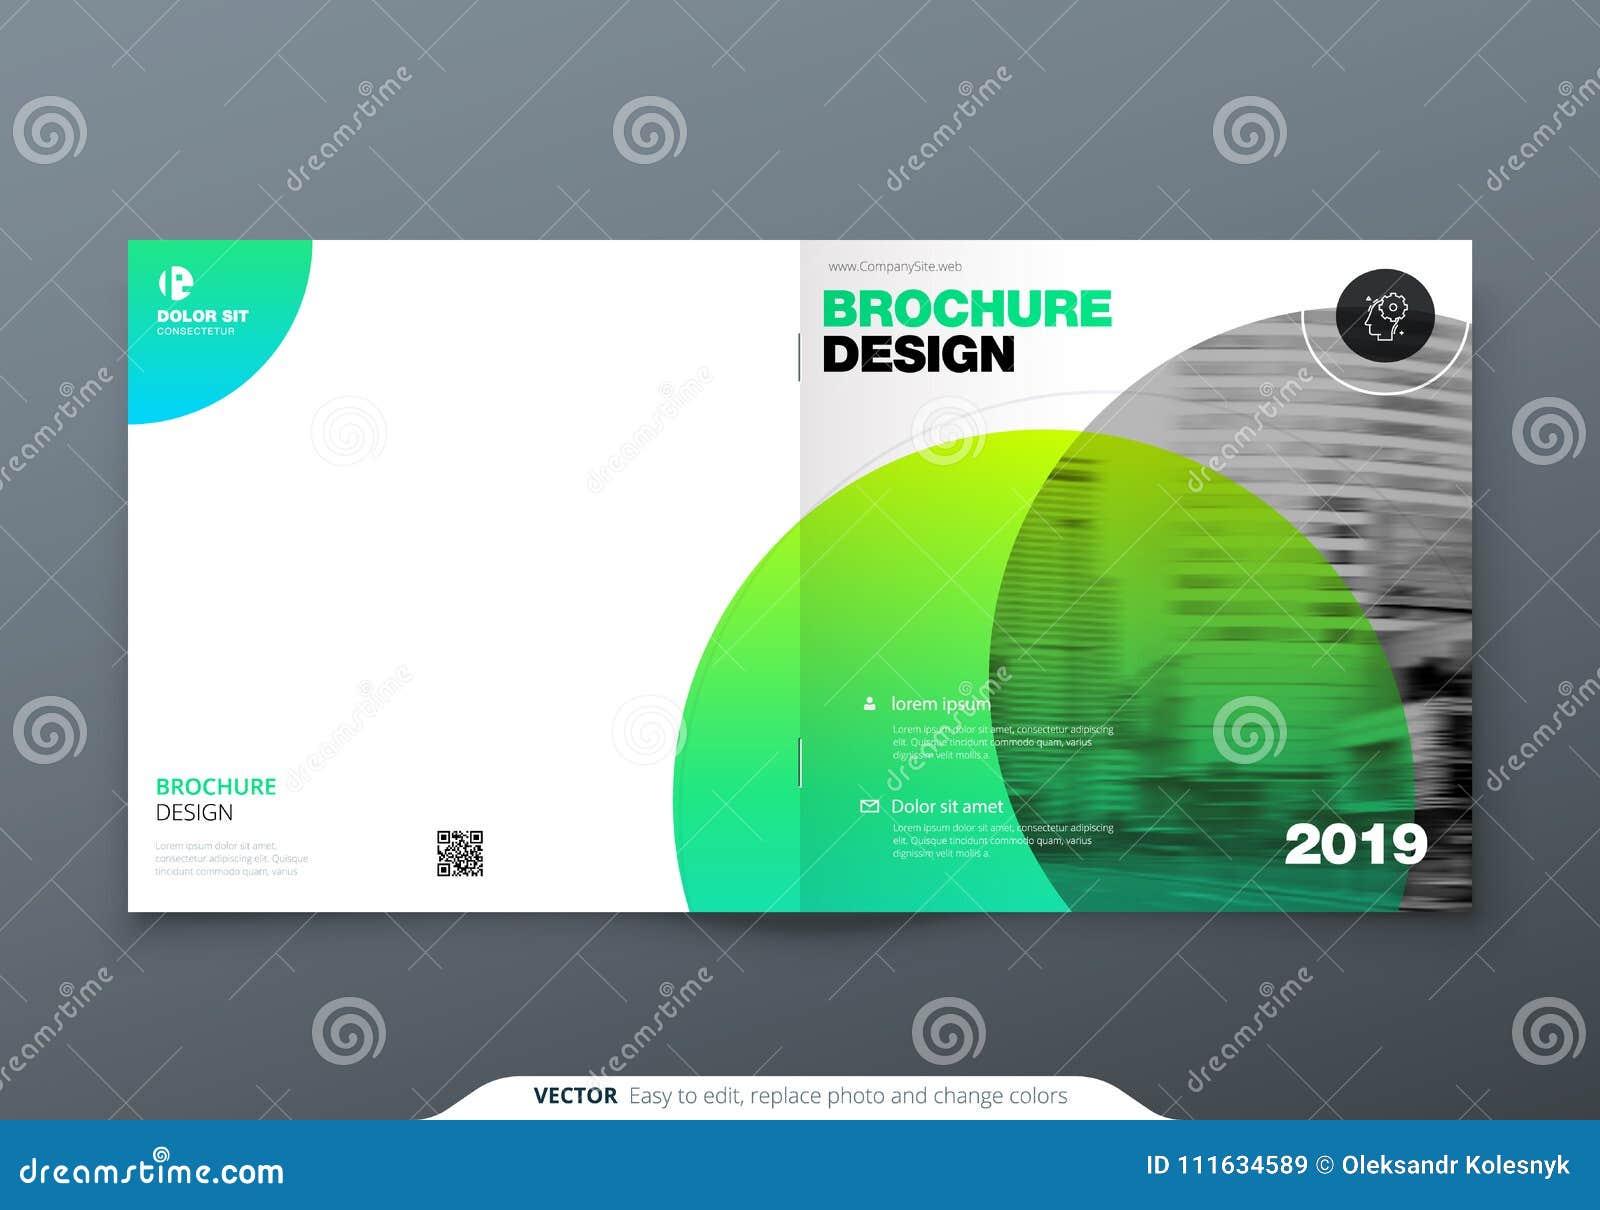 Square Brochure Design Green Corporate Business Rectangle Template Report Catalog Magazine